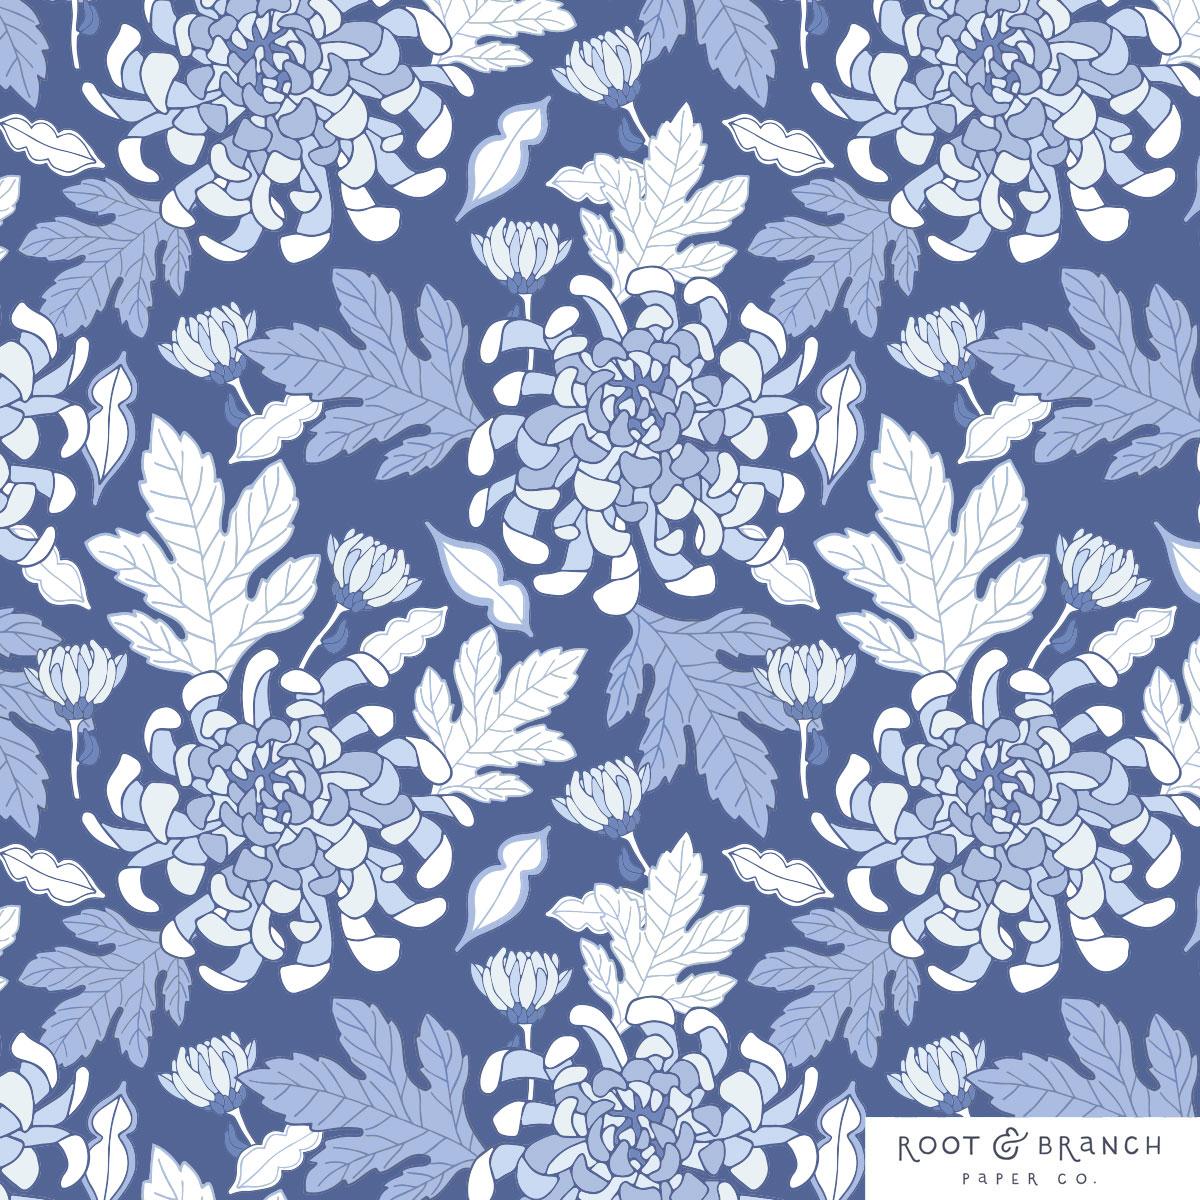 chrysanthemum-blue-instagram.jpg